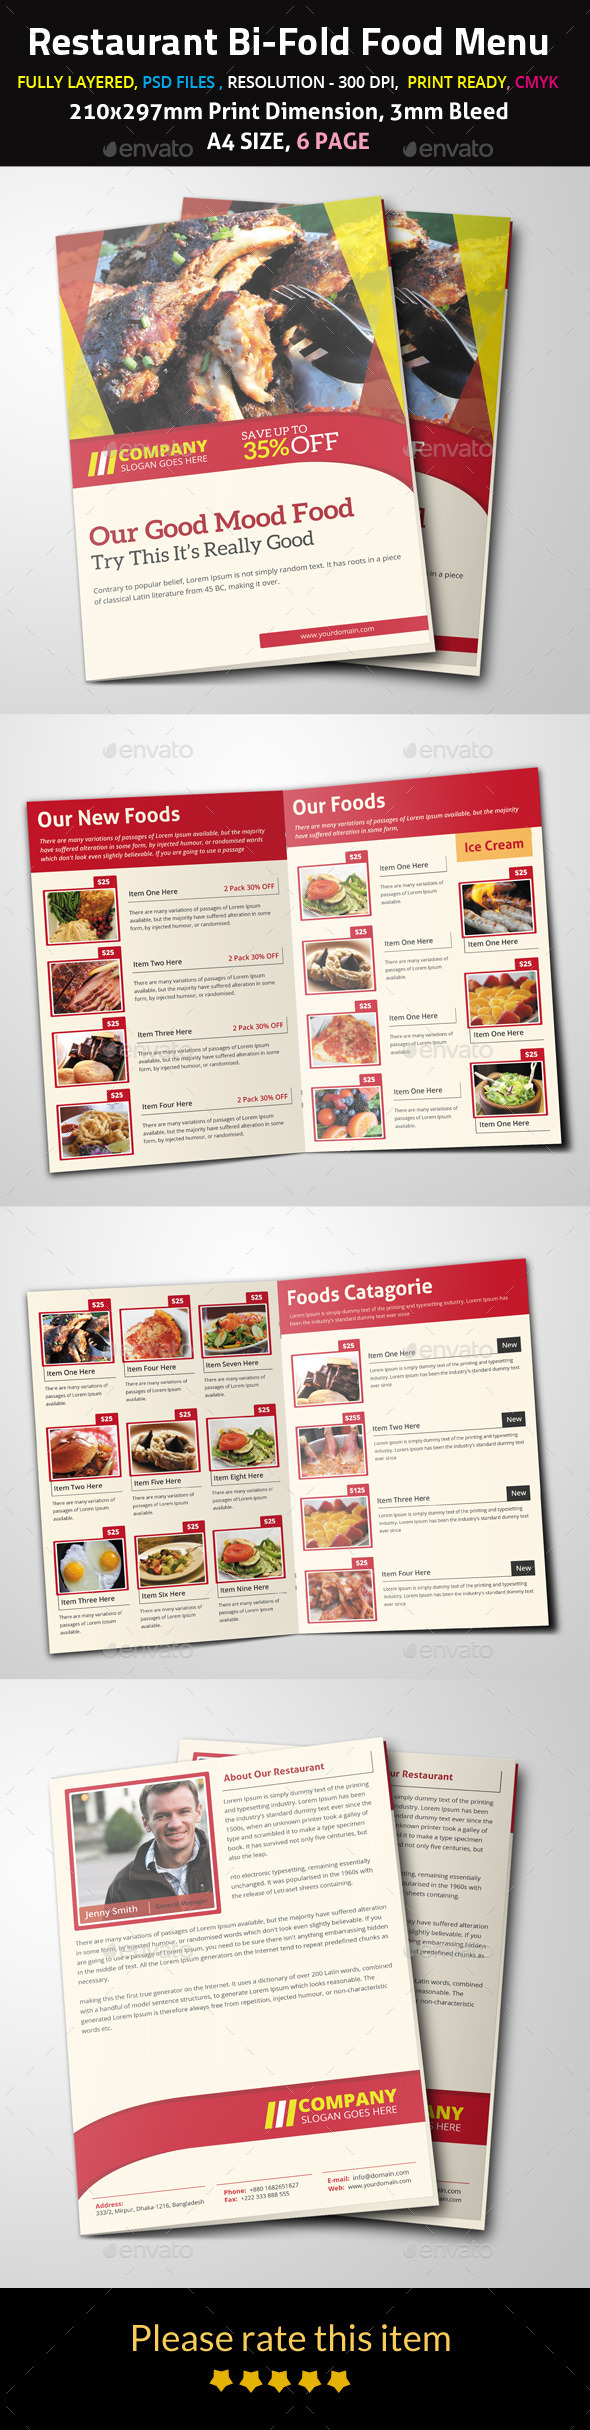 Restaurant Bi-Fold Food Menu - Food Menus Print Templates